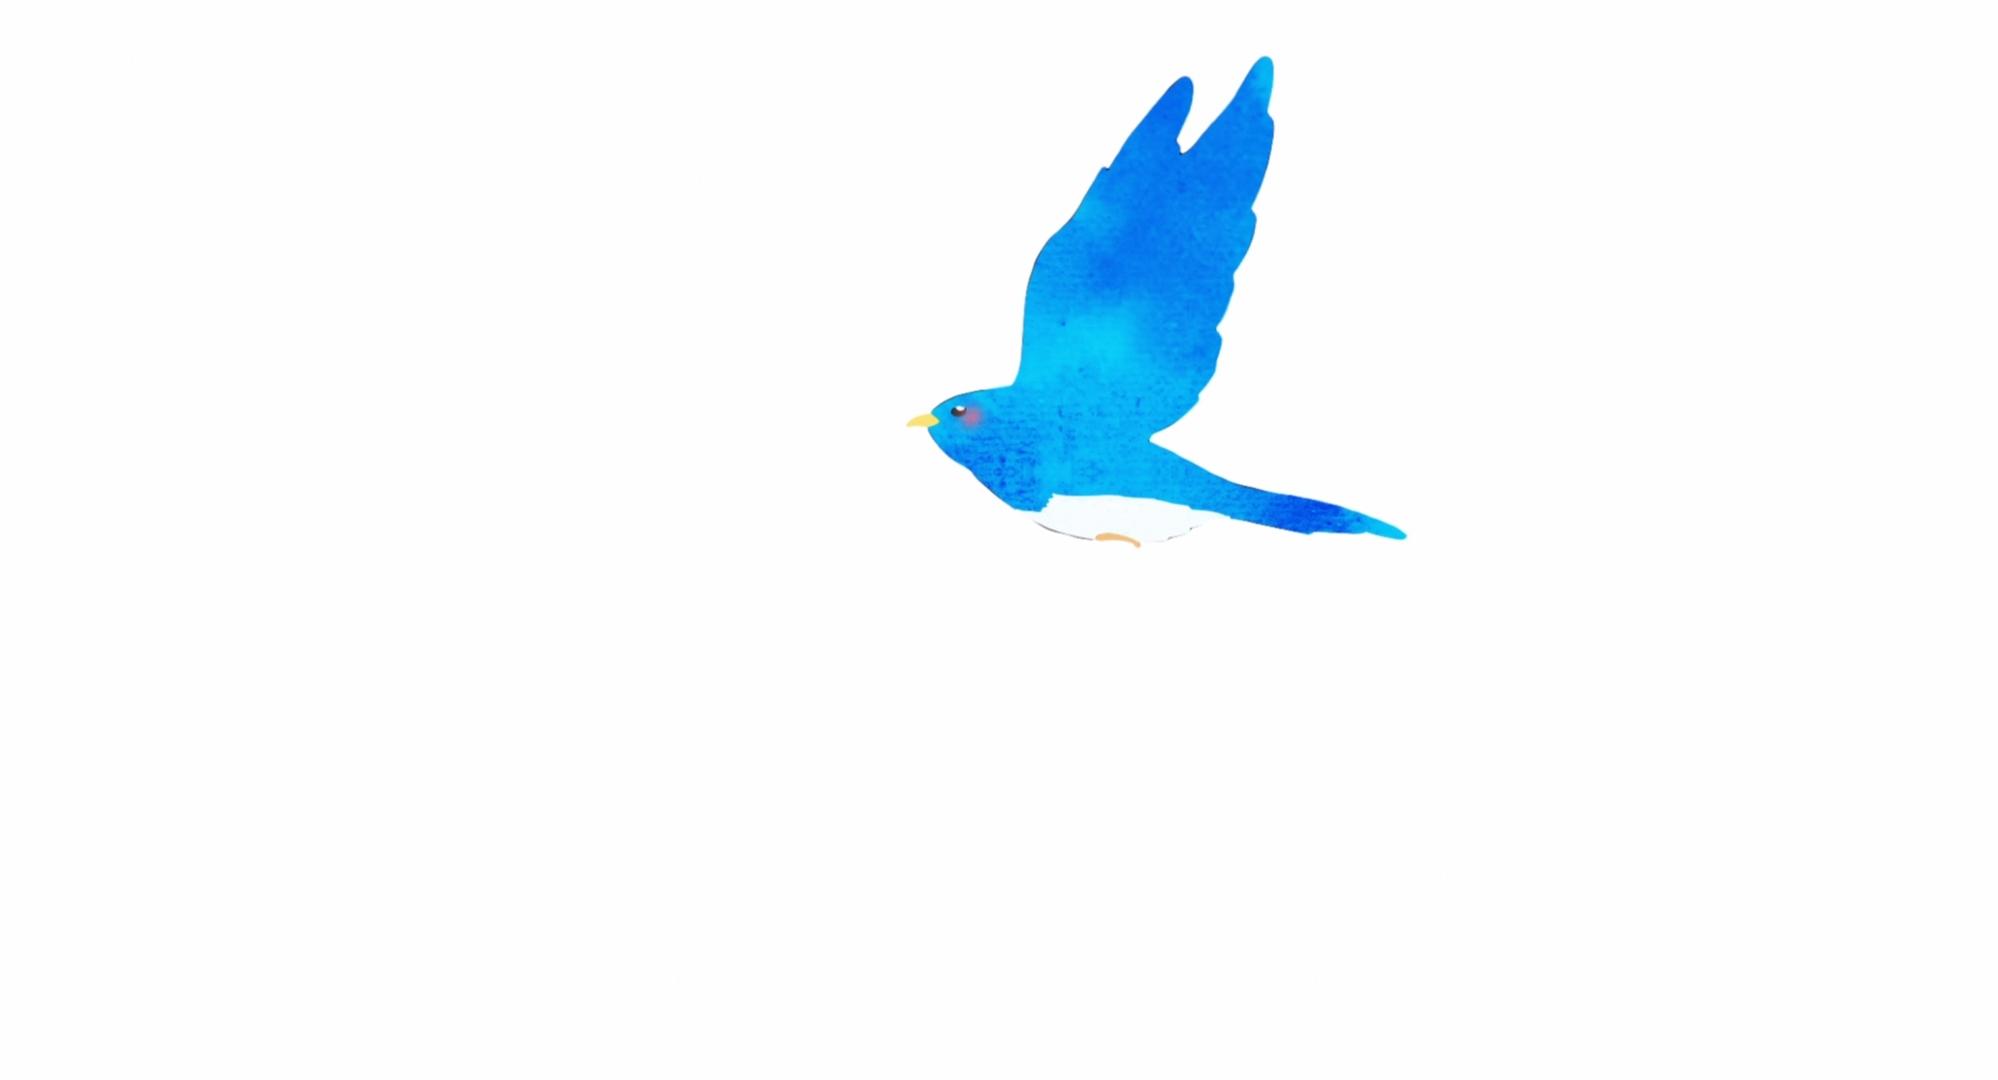 bluesumple5.jpg